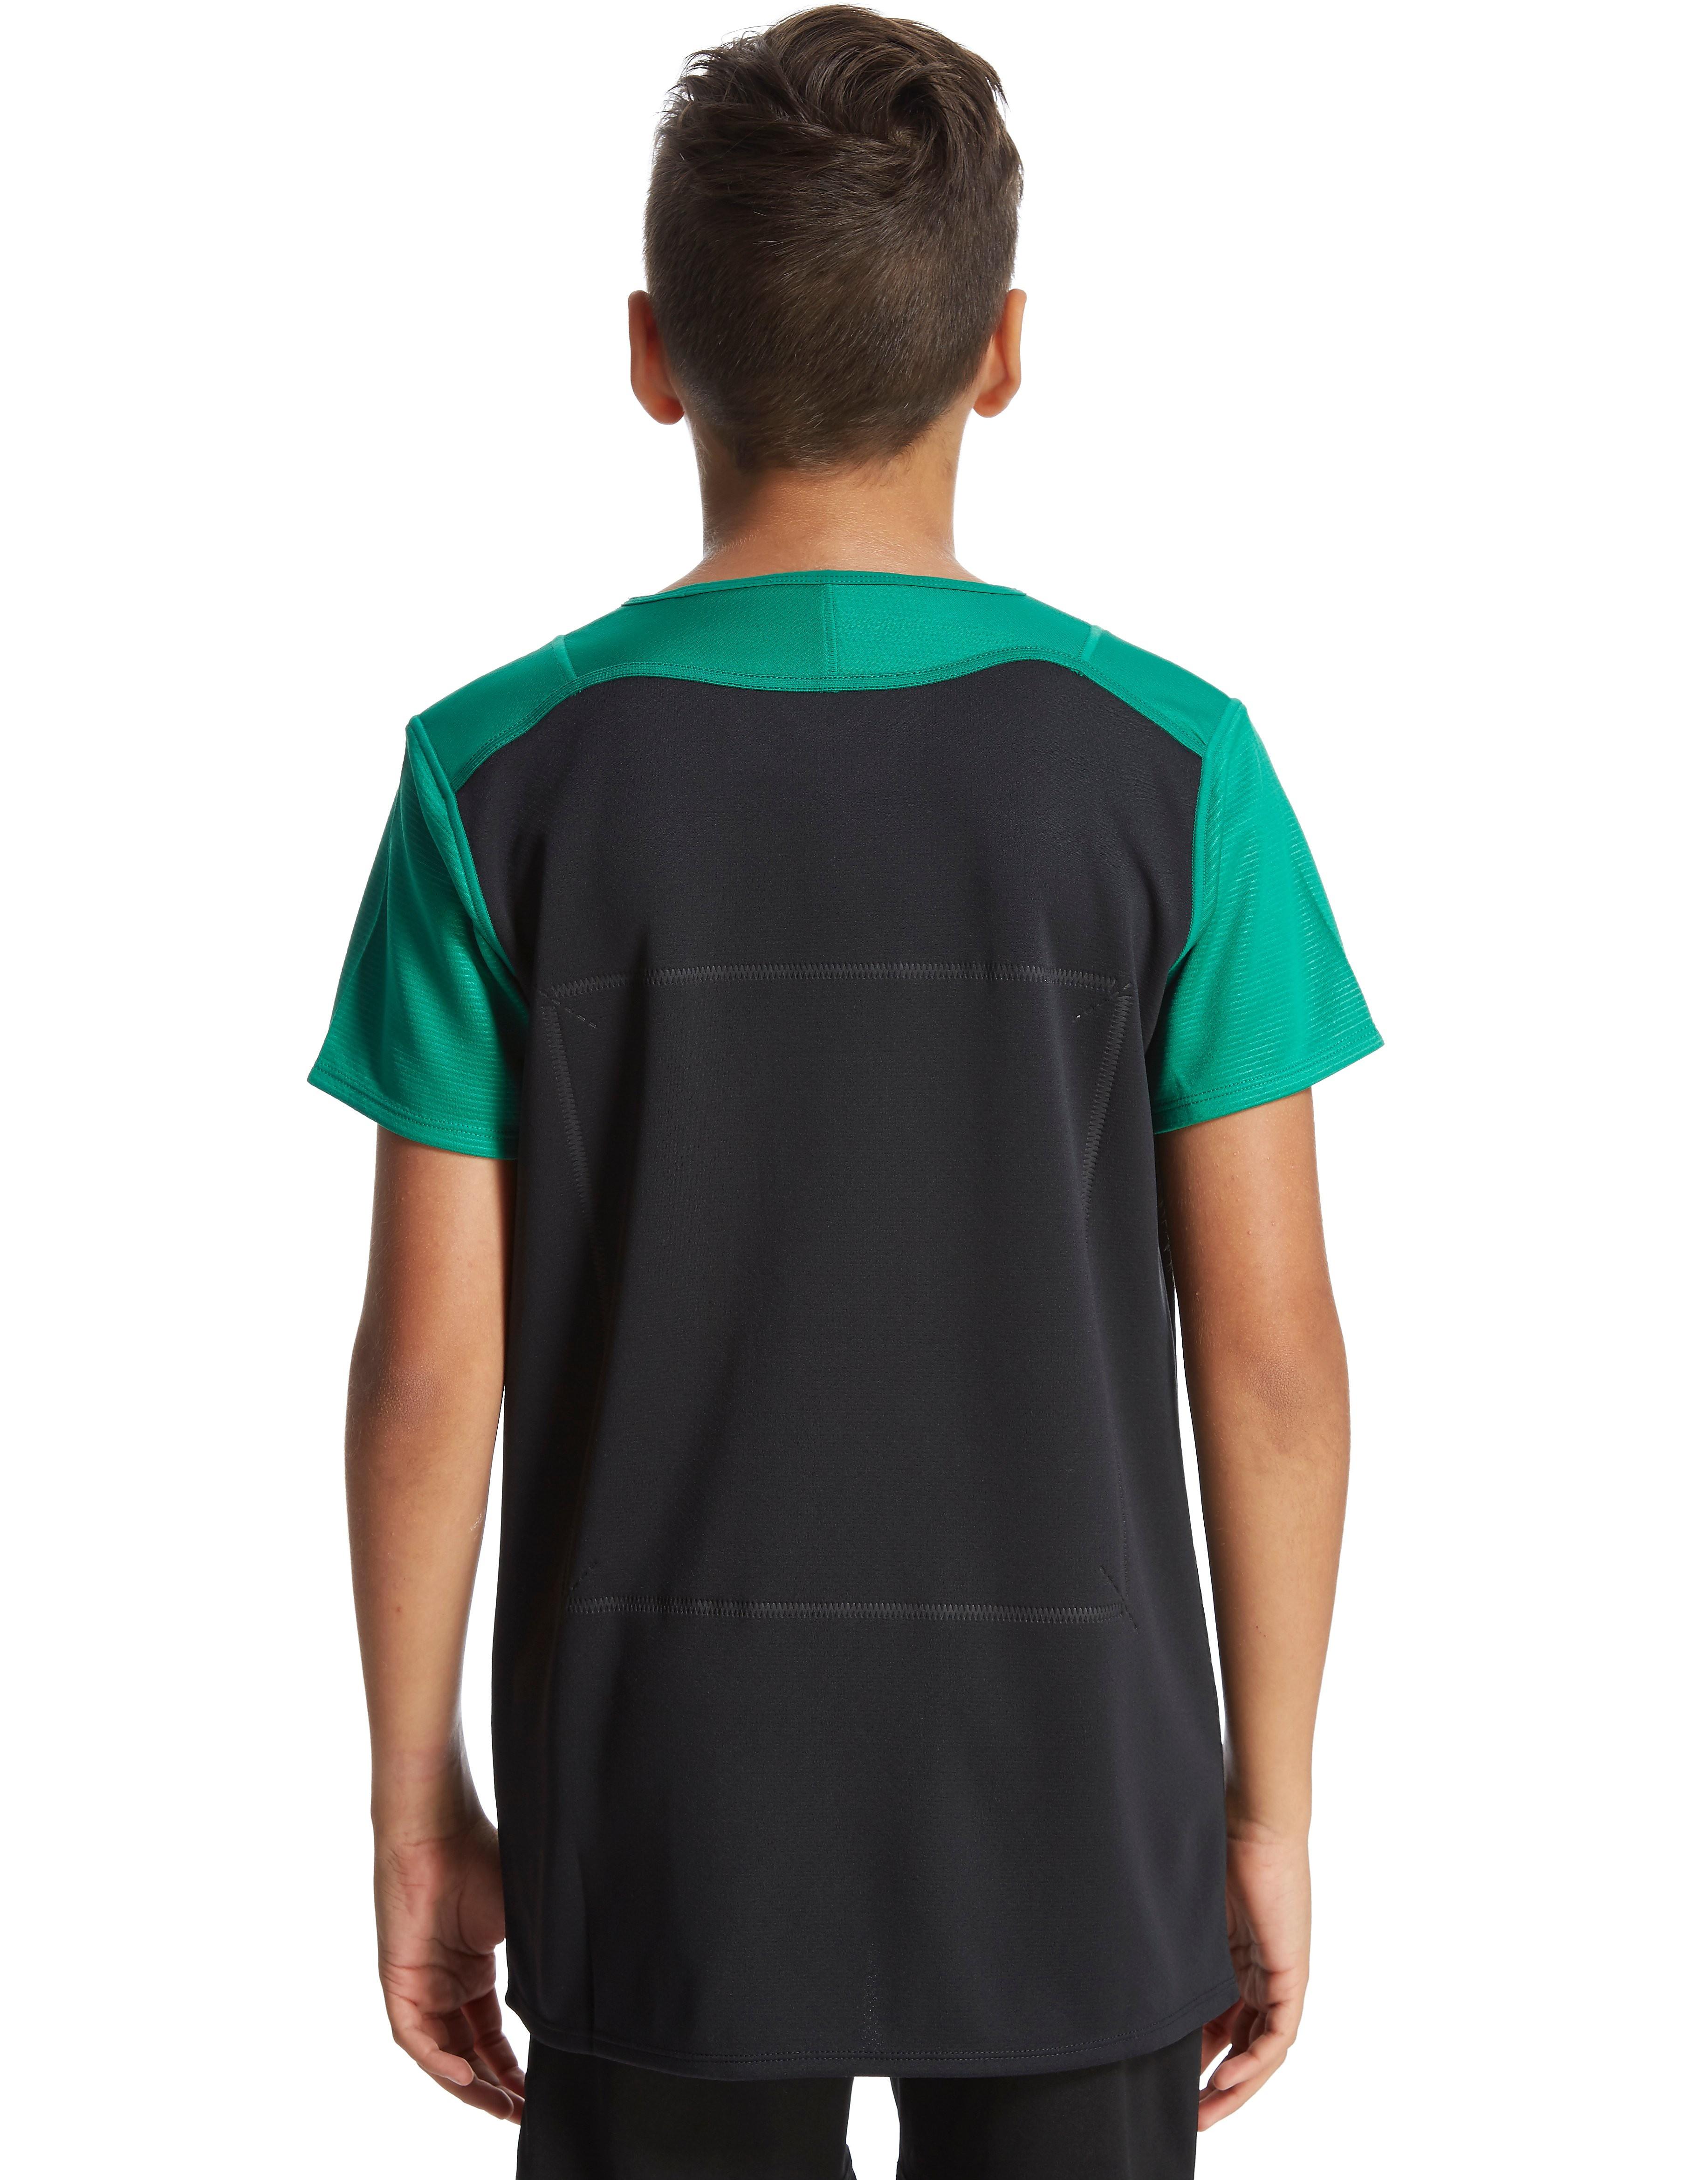 Canterbury Ireland Rugby World Cup 2015 Away Shirt Junior